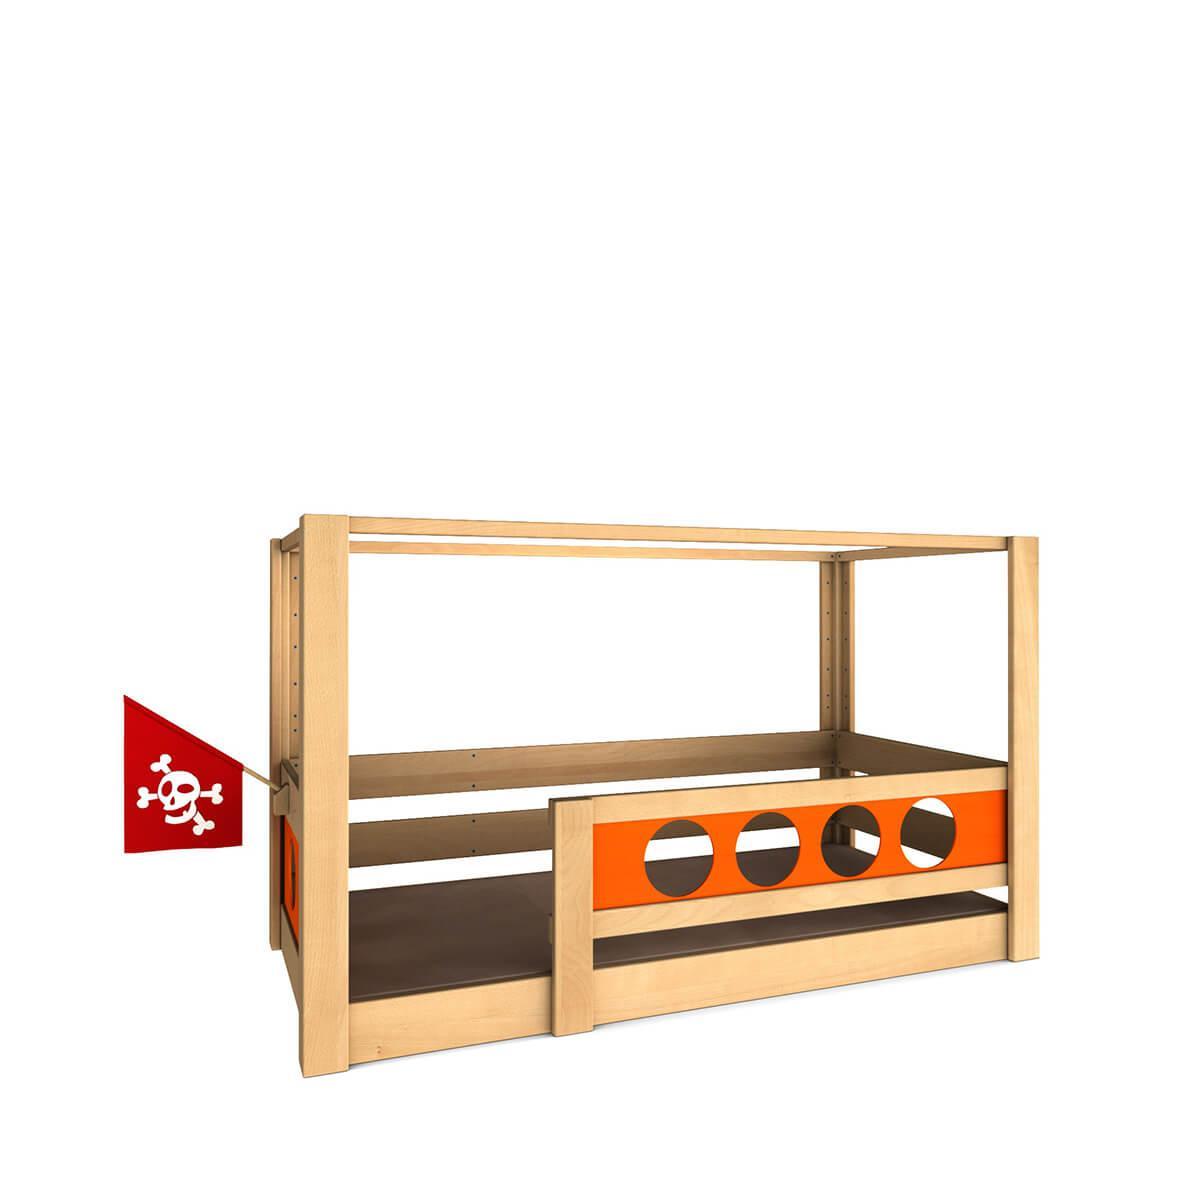 Pirat Himmelbett DELUXE de Breuyn geölt-Füllungen orange